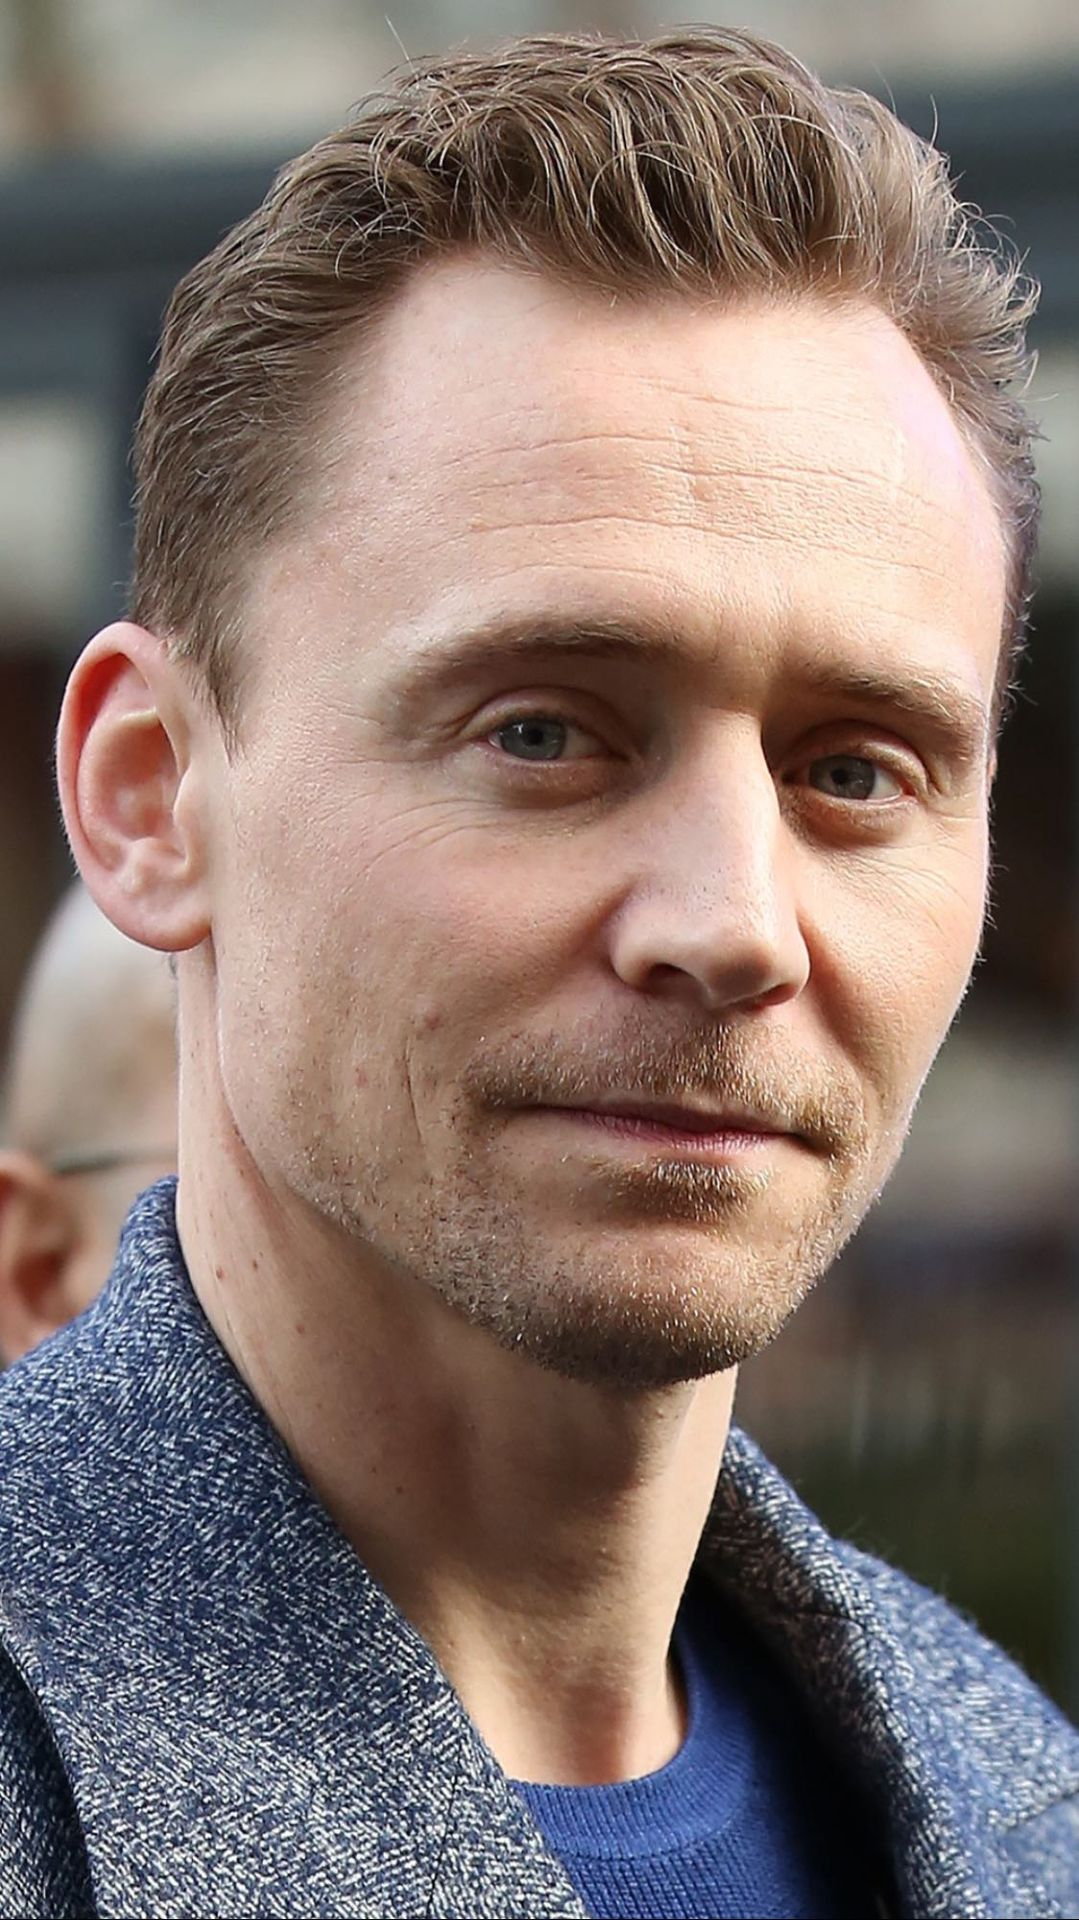 Tom Hiddleston Finally Learned How to Grow a Beard | GQ